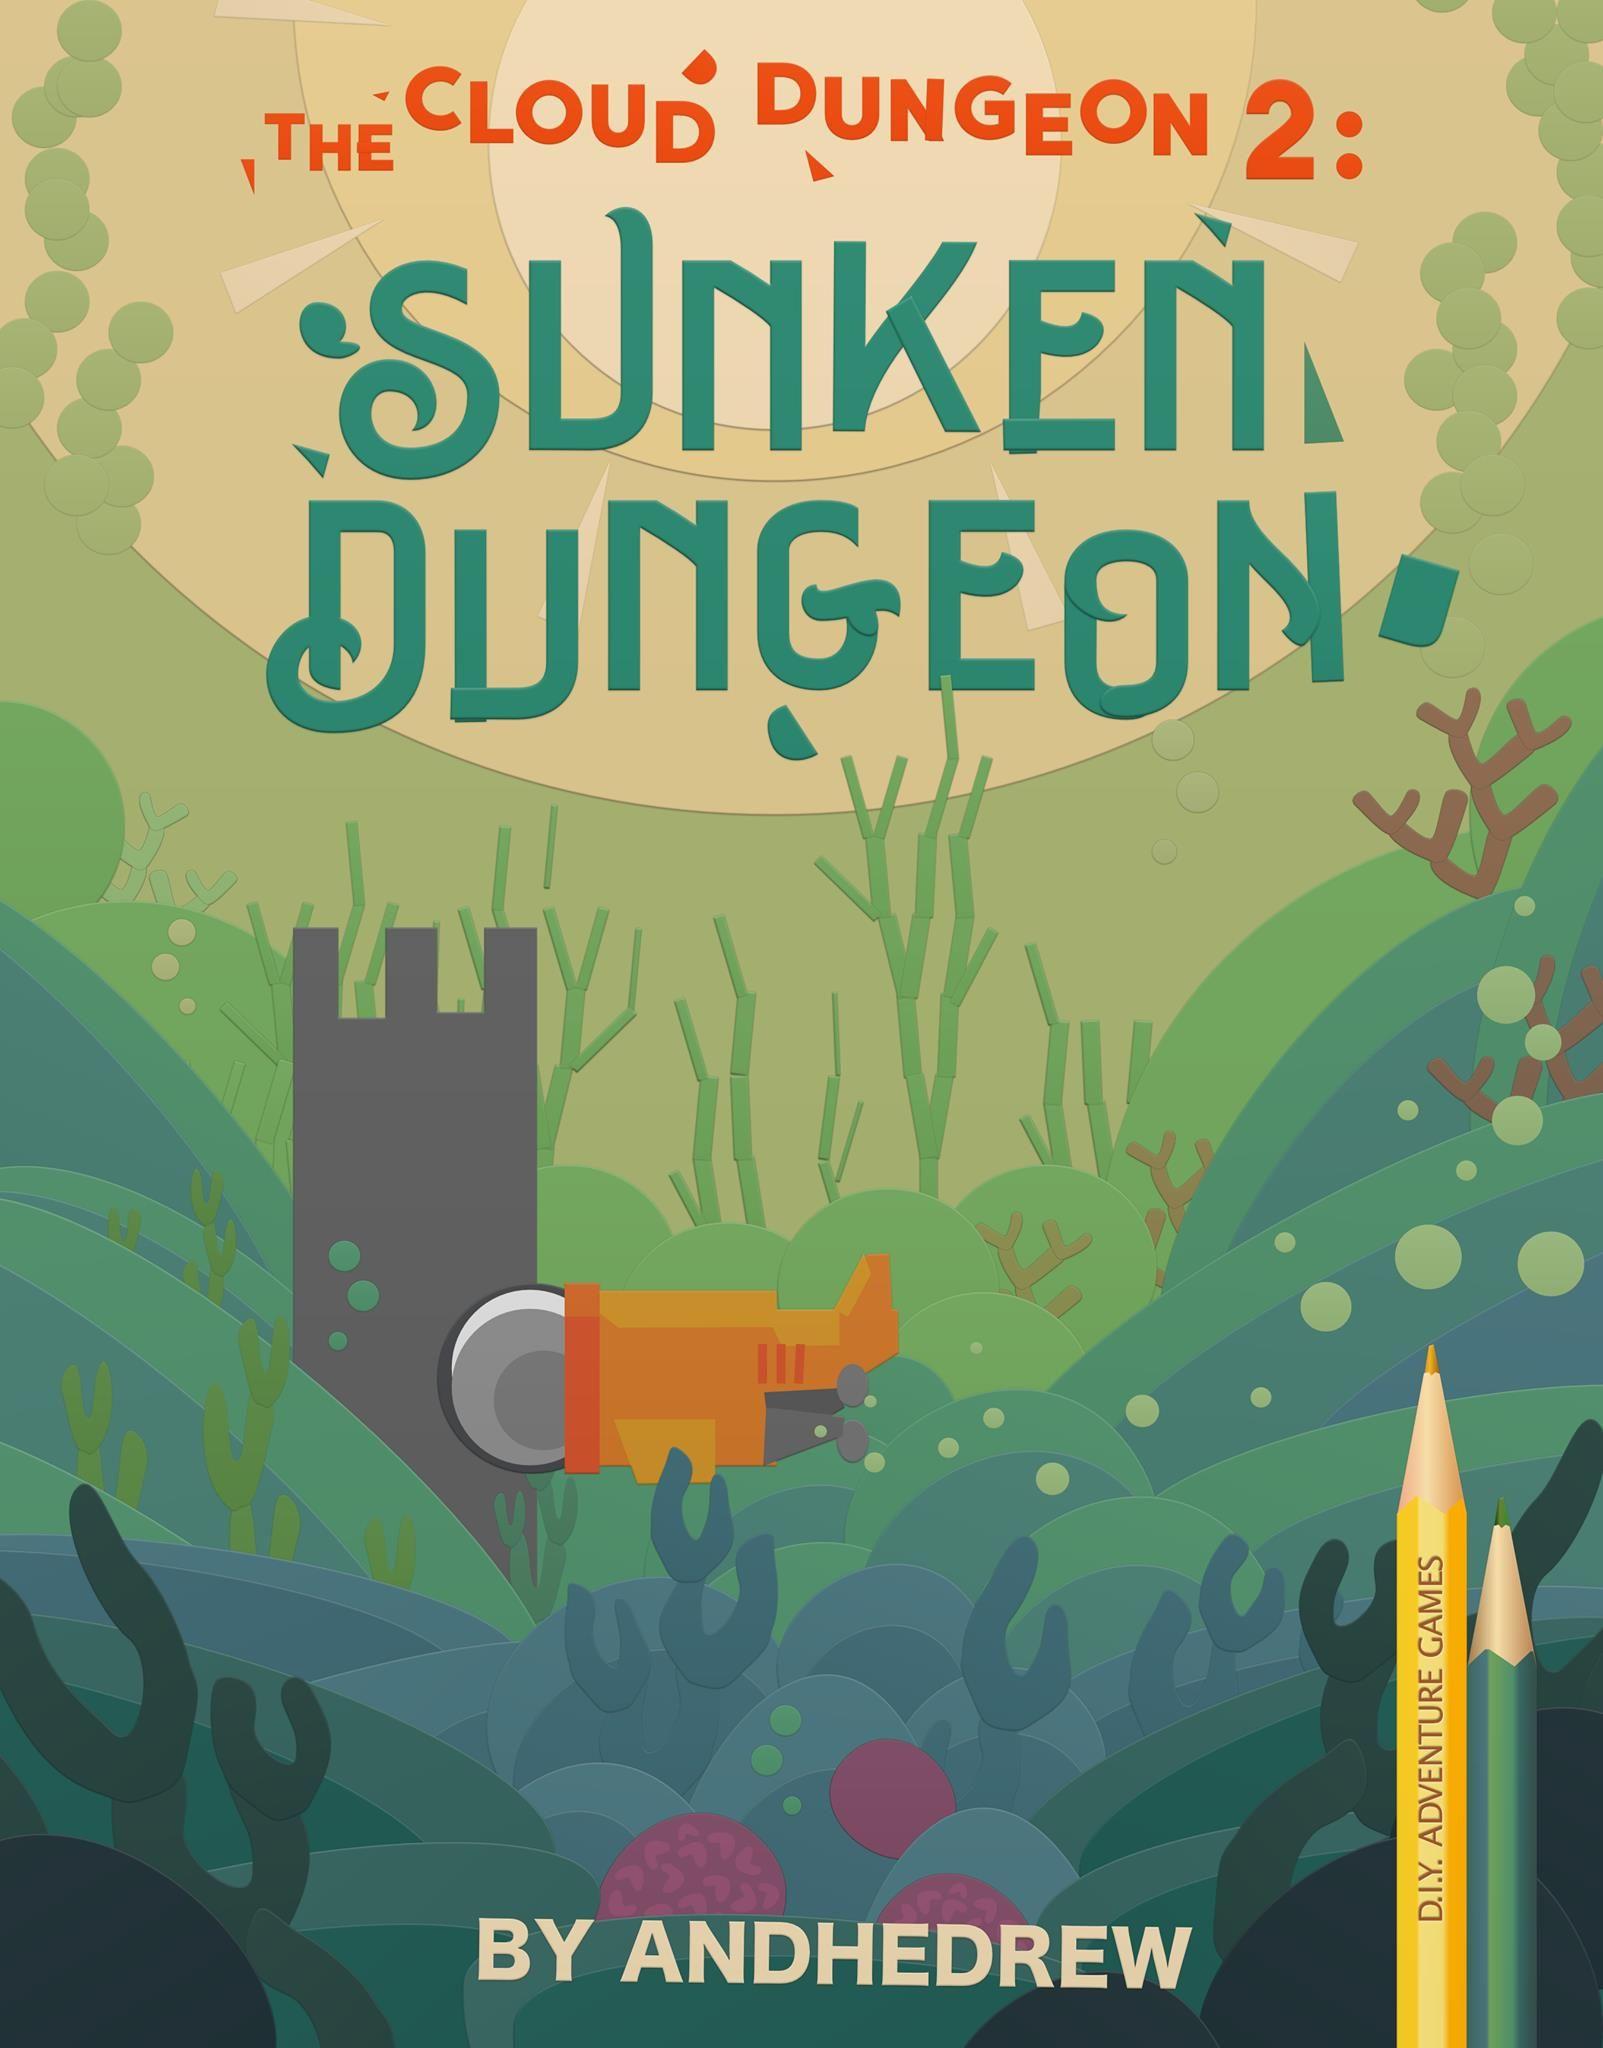 The Cloud Dungeon 2: Sunken Dungeon